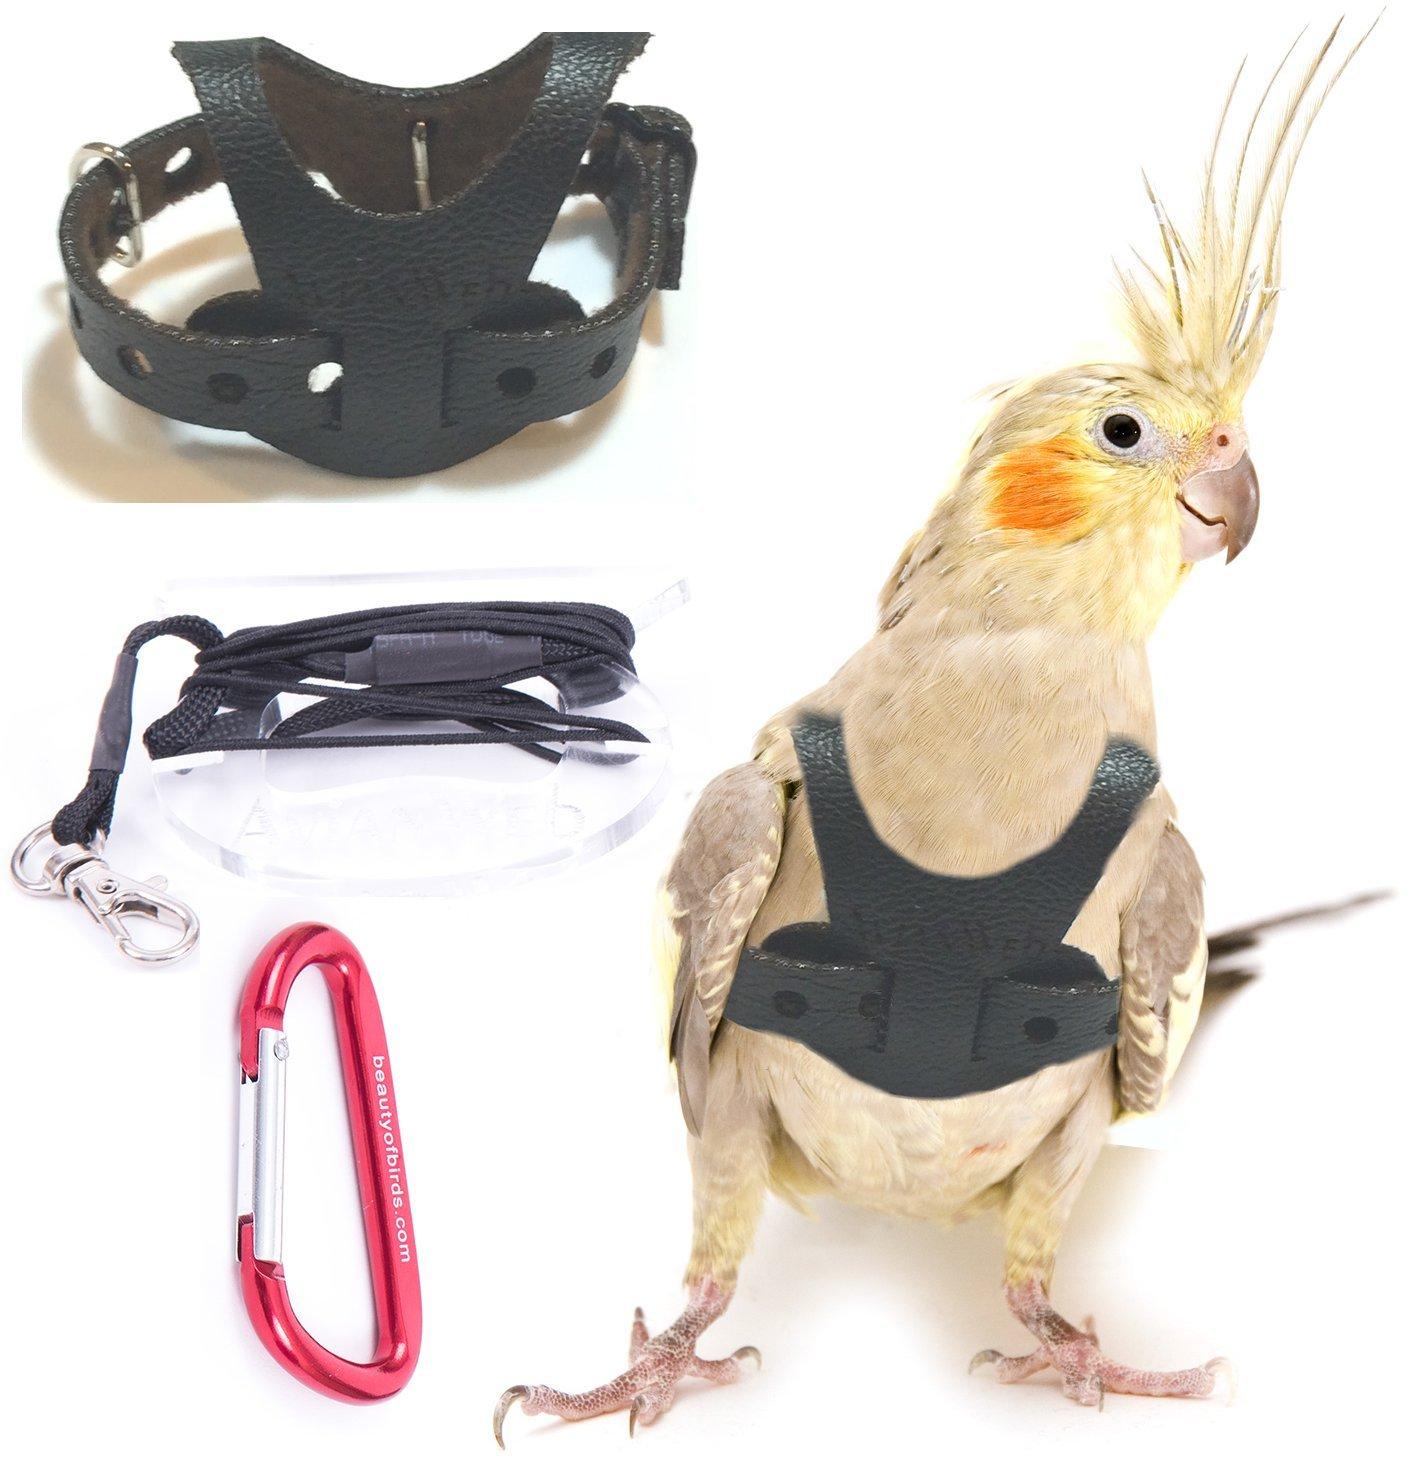 Avianweb EZ Rider Bird Harness with 8 Ft Leash (Cockatiel) by Avianweb